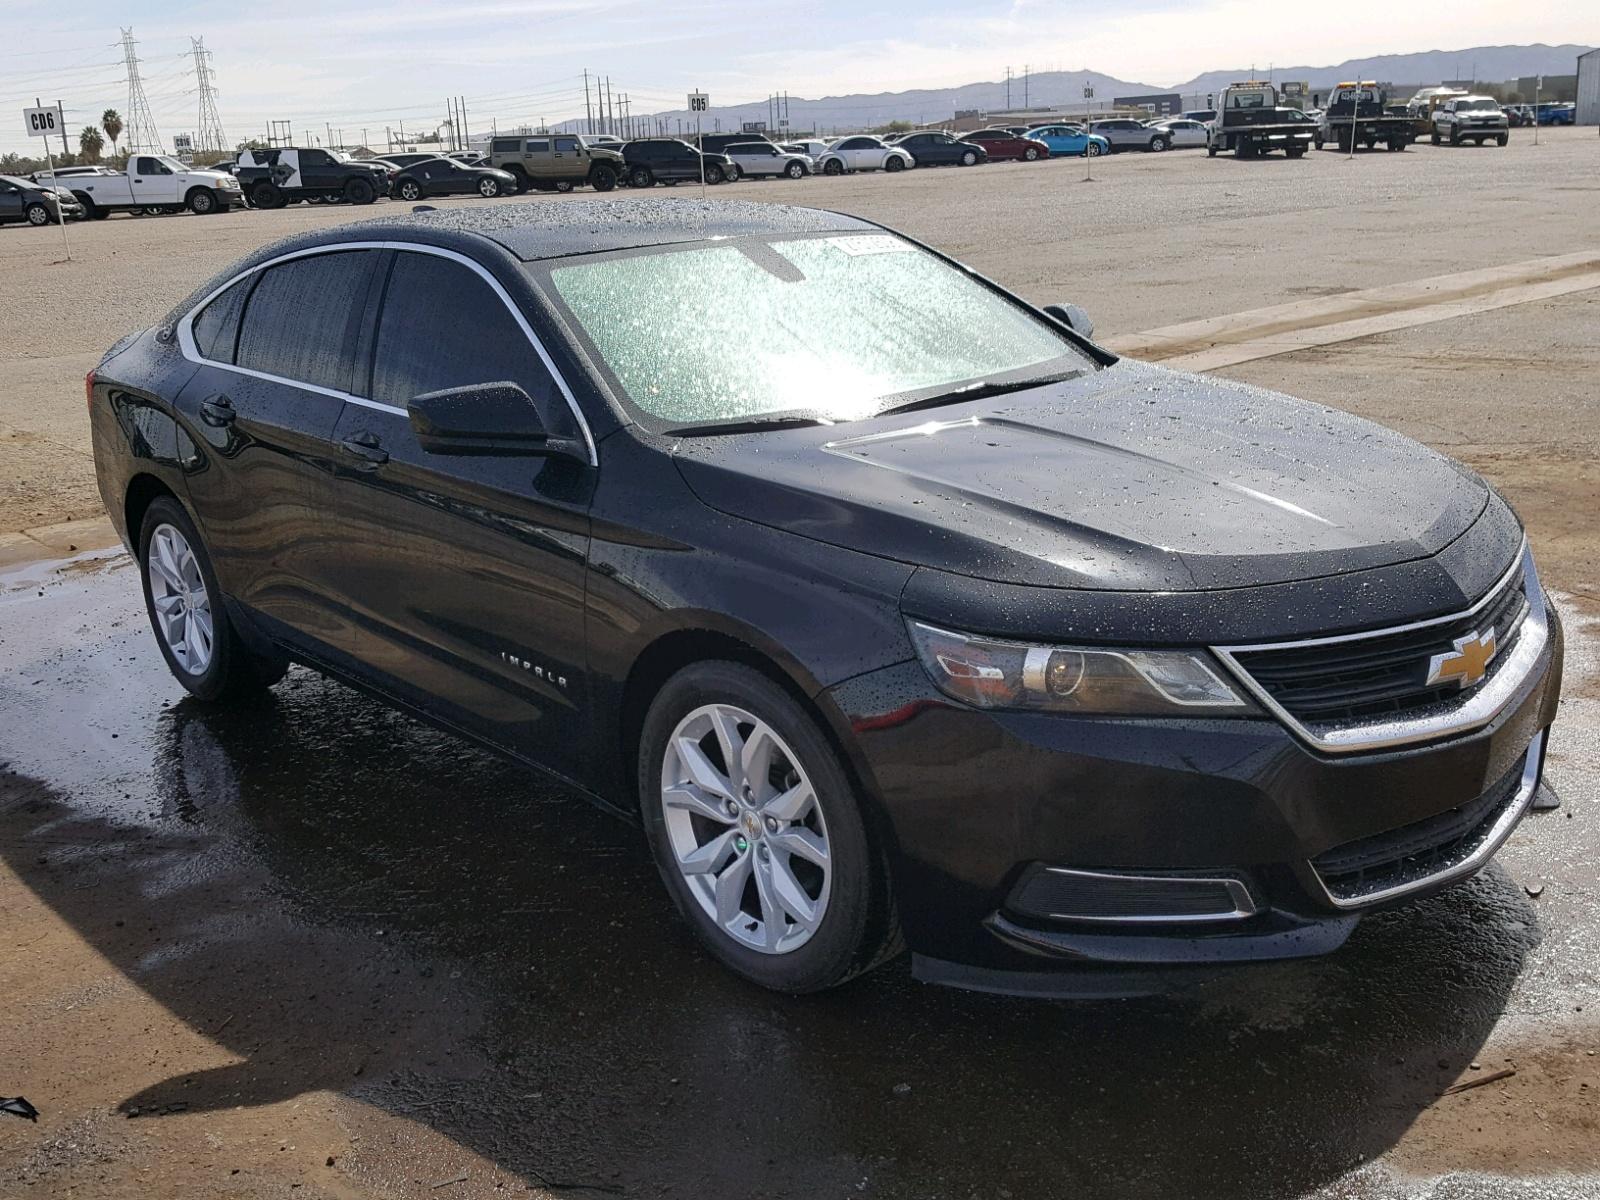 ltz news friendly detail mar chevrolet make media technologies tahoe pages suvs en family content us impala vehicles